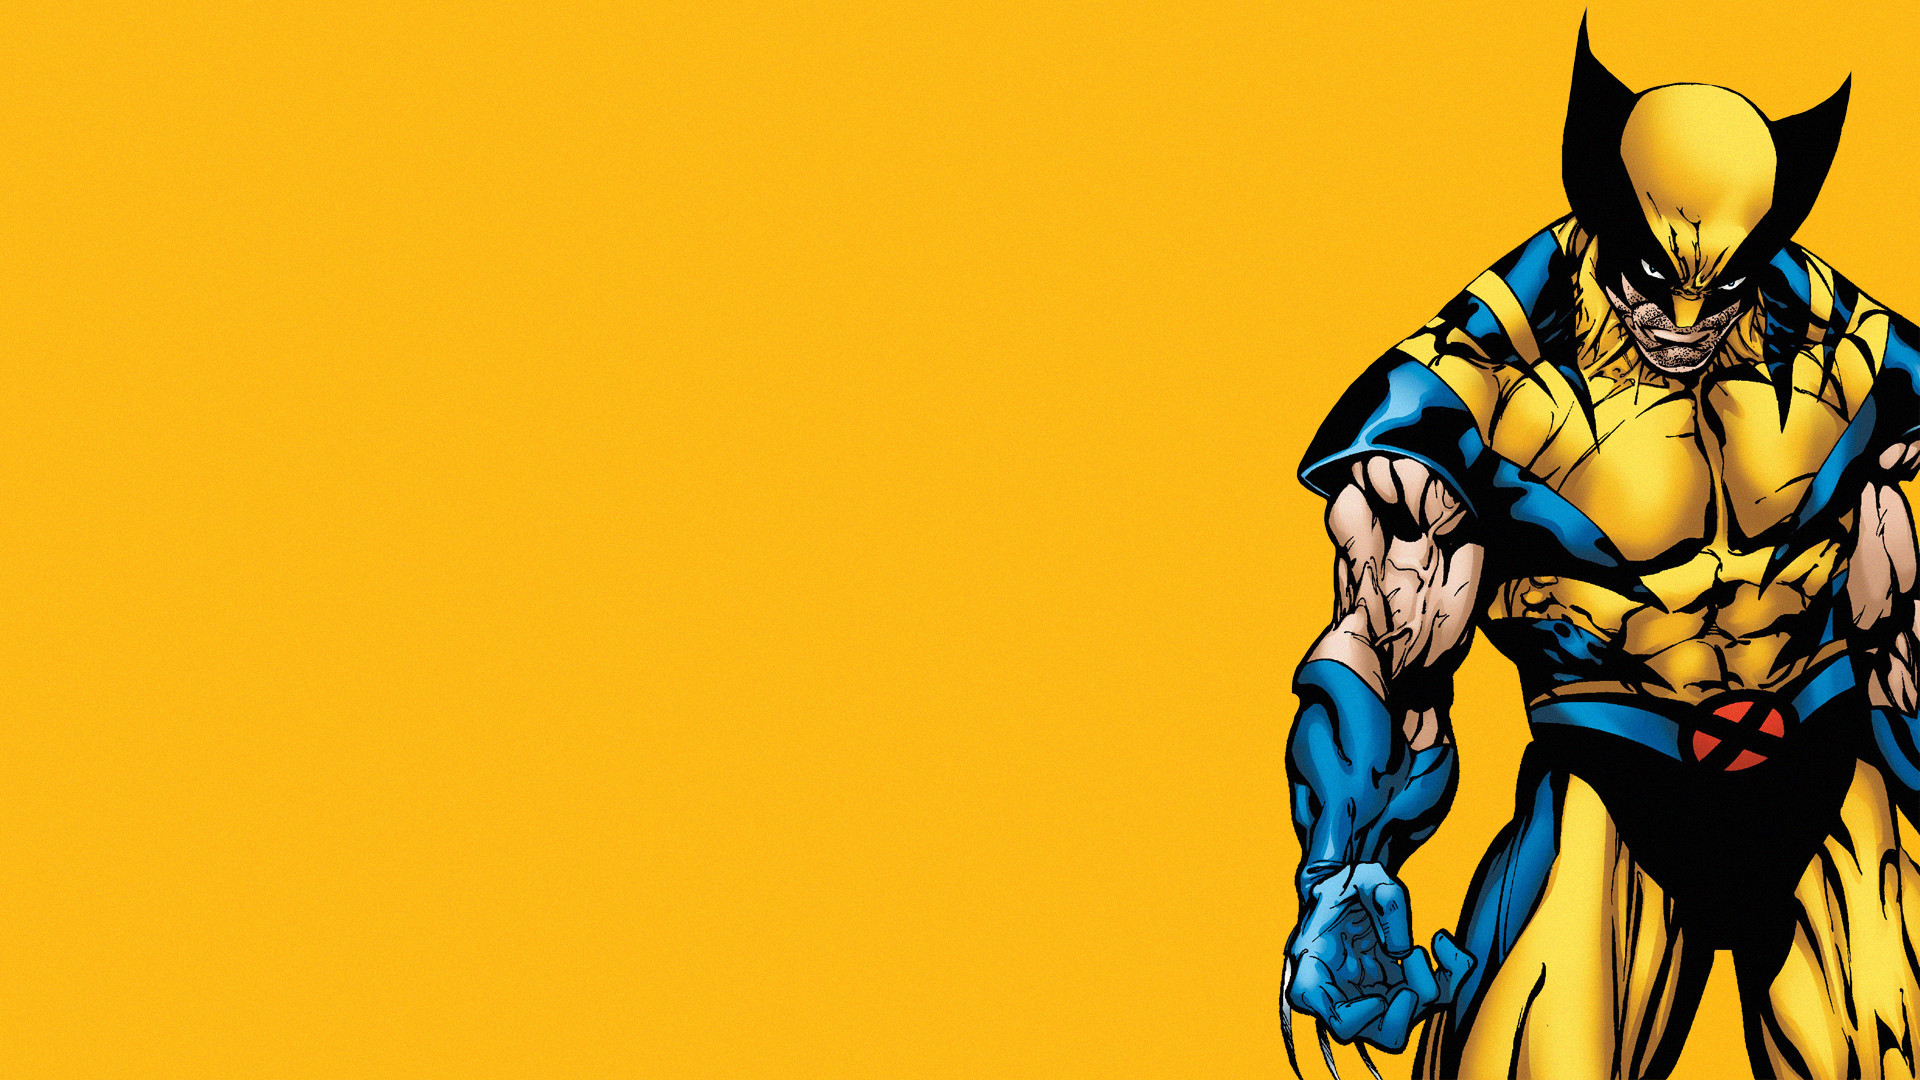 Super High Res Pc Wallpaper Pubg Wolverine Wallpaper Hd 77 Images